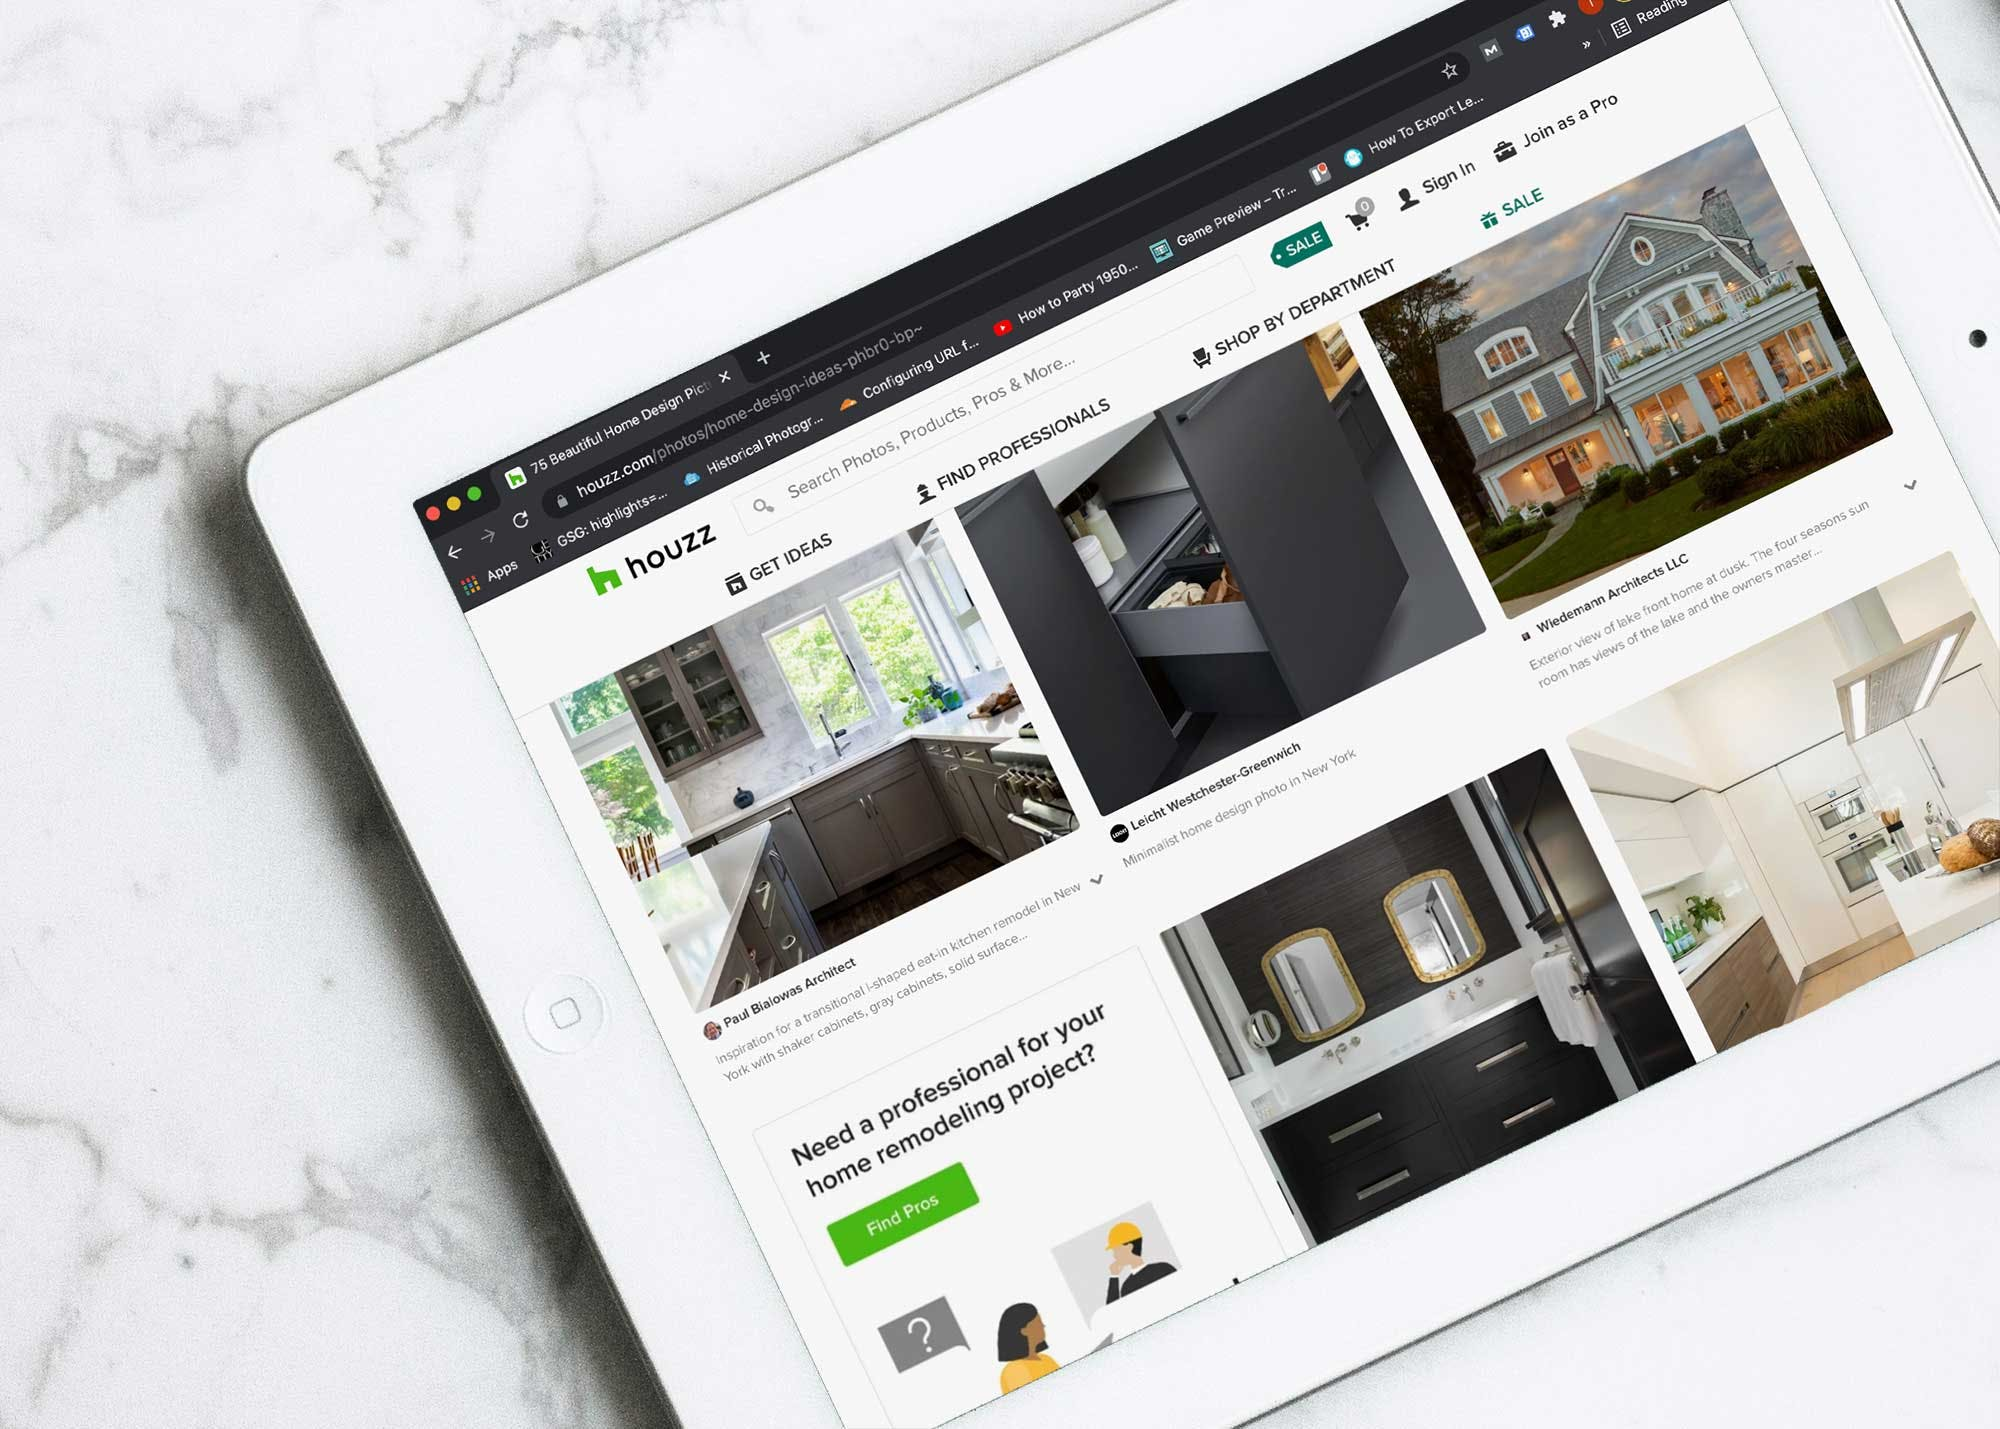 Houzz interior design social media platform showing on a tablet